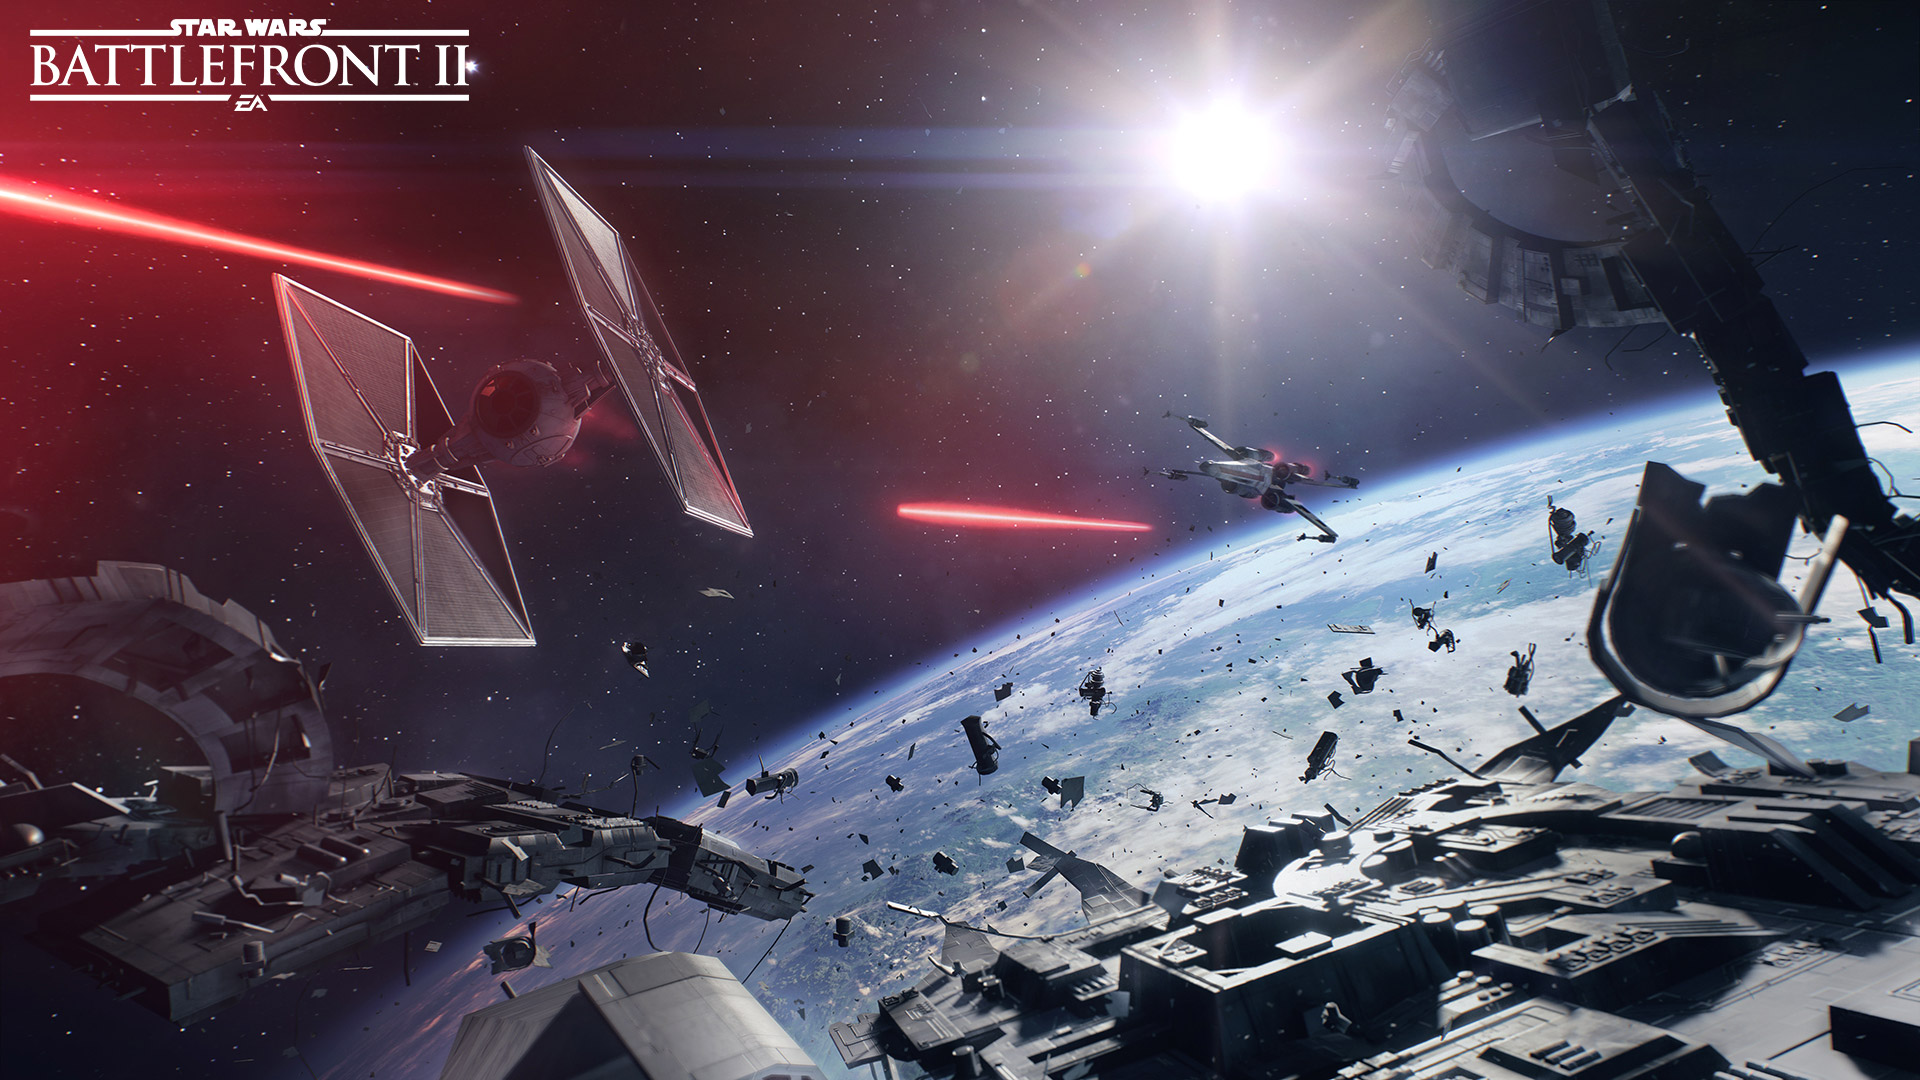 Star Wars: Battlefront II Wallpaper in 1920x1080